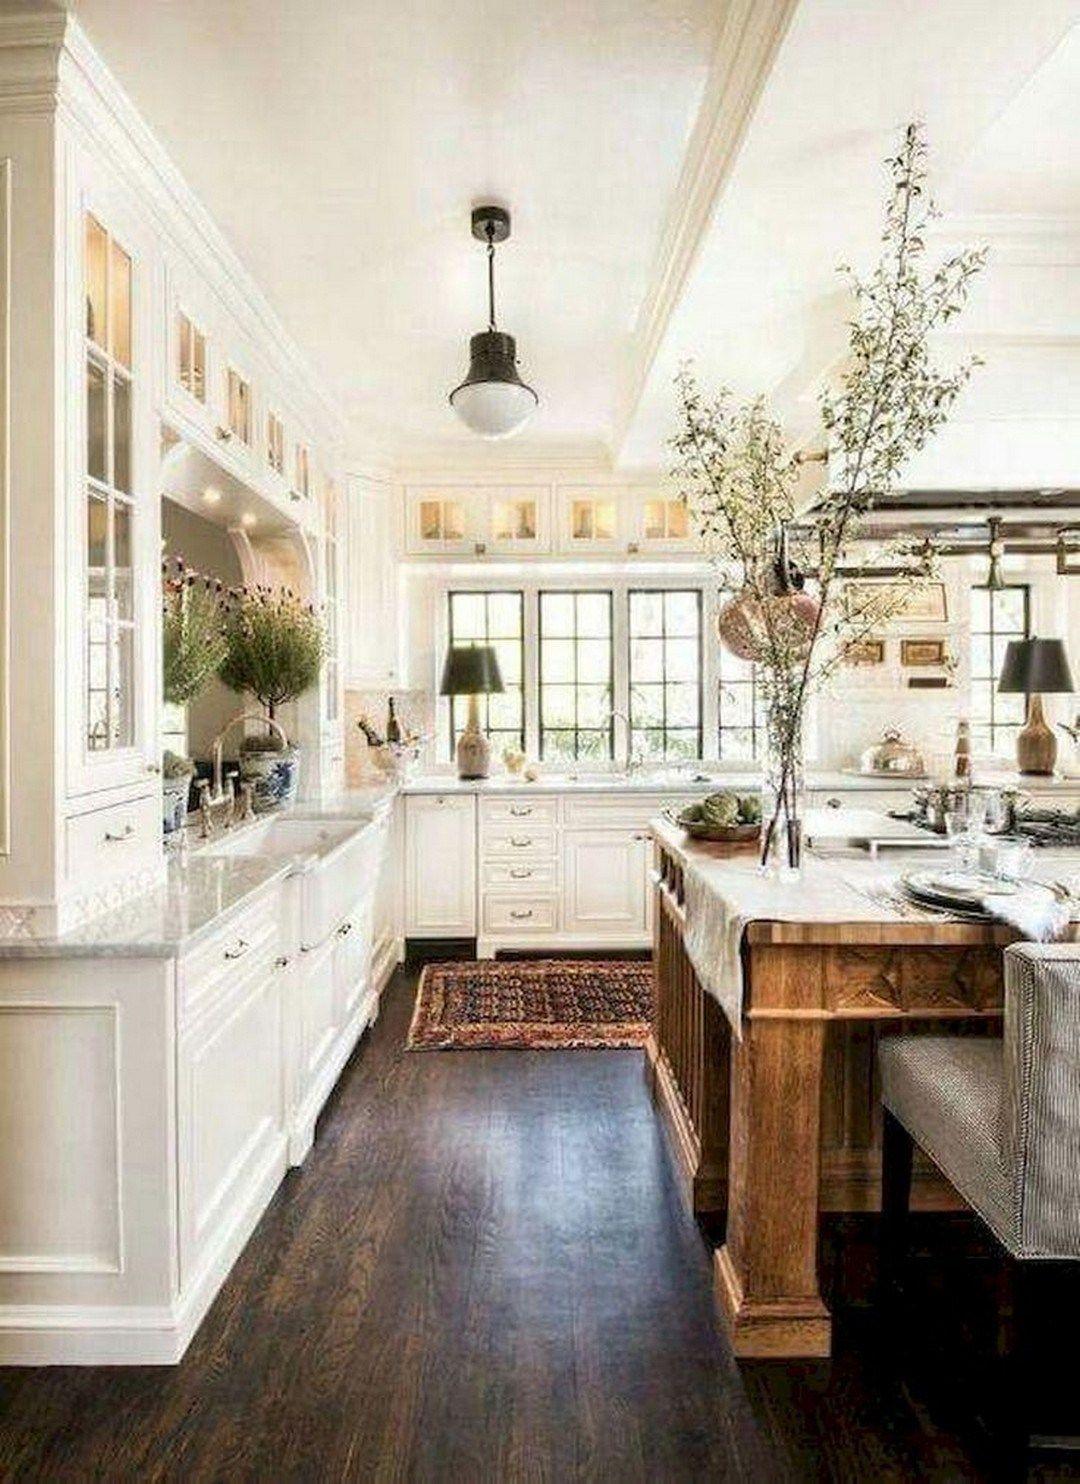 33 Charming French Kitchen Decor Inspirational Ideas 19